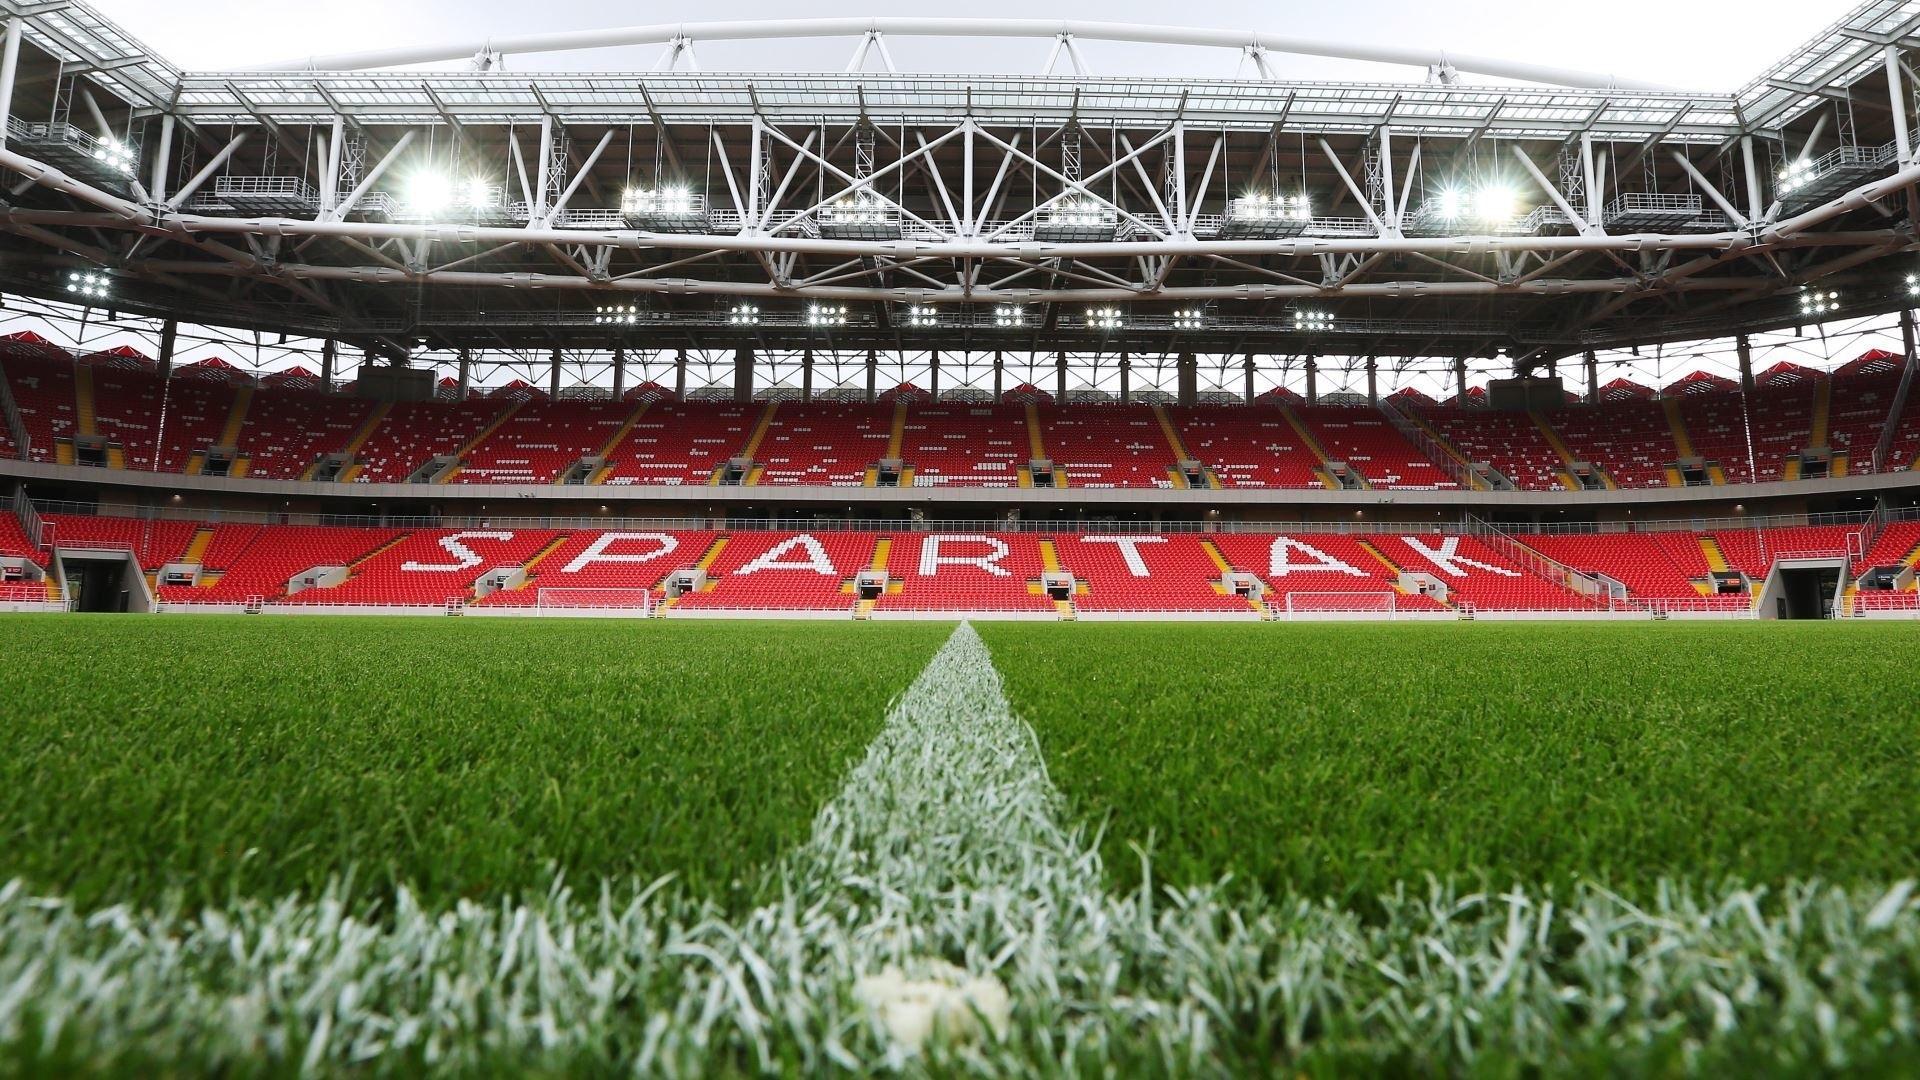 Fondo De Fútbol Hd: FC Spartak Stadium, Campo De Fútbol, Césped, Las Luces